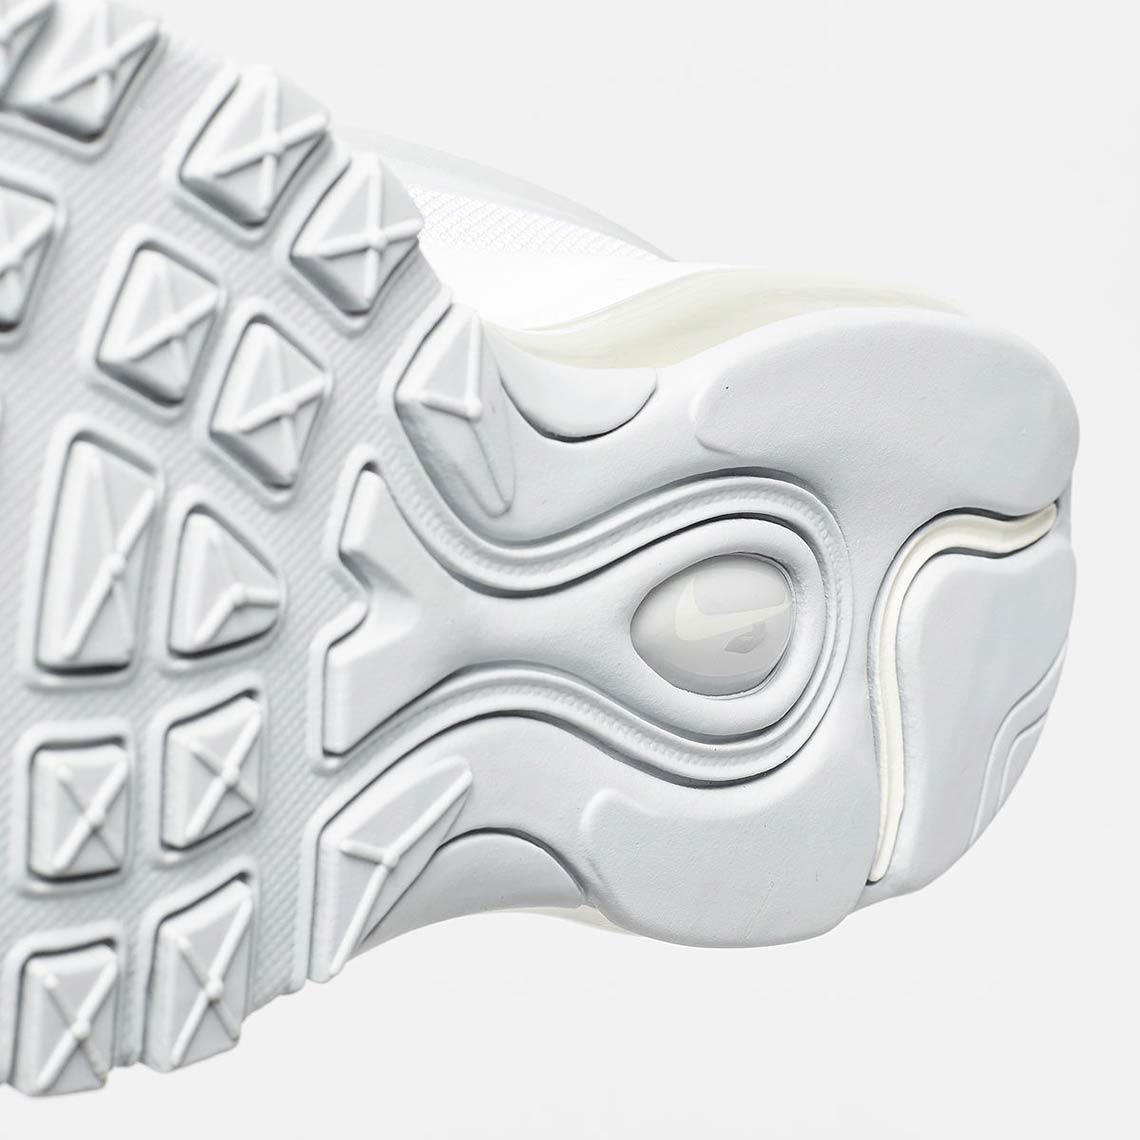 sale retailer 15314 1d678 Nike Air Max Deluxe Pure Platinum AV2589-100   SneakerNews.com